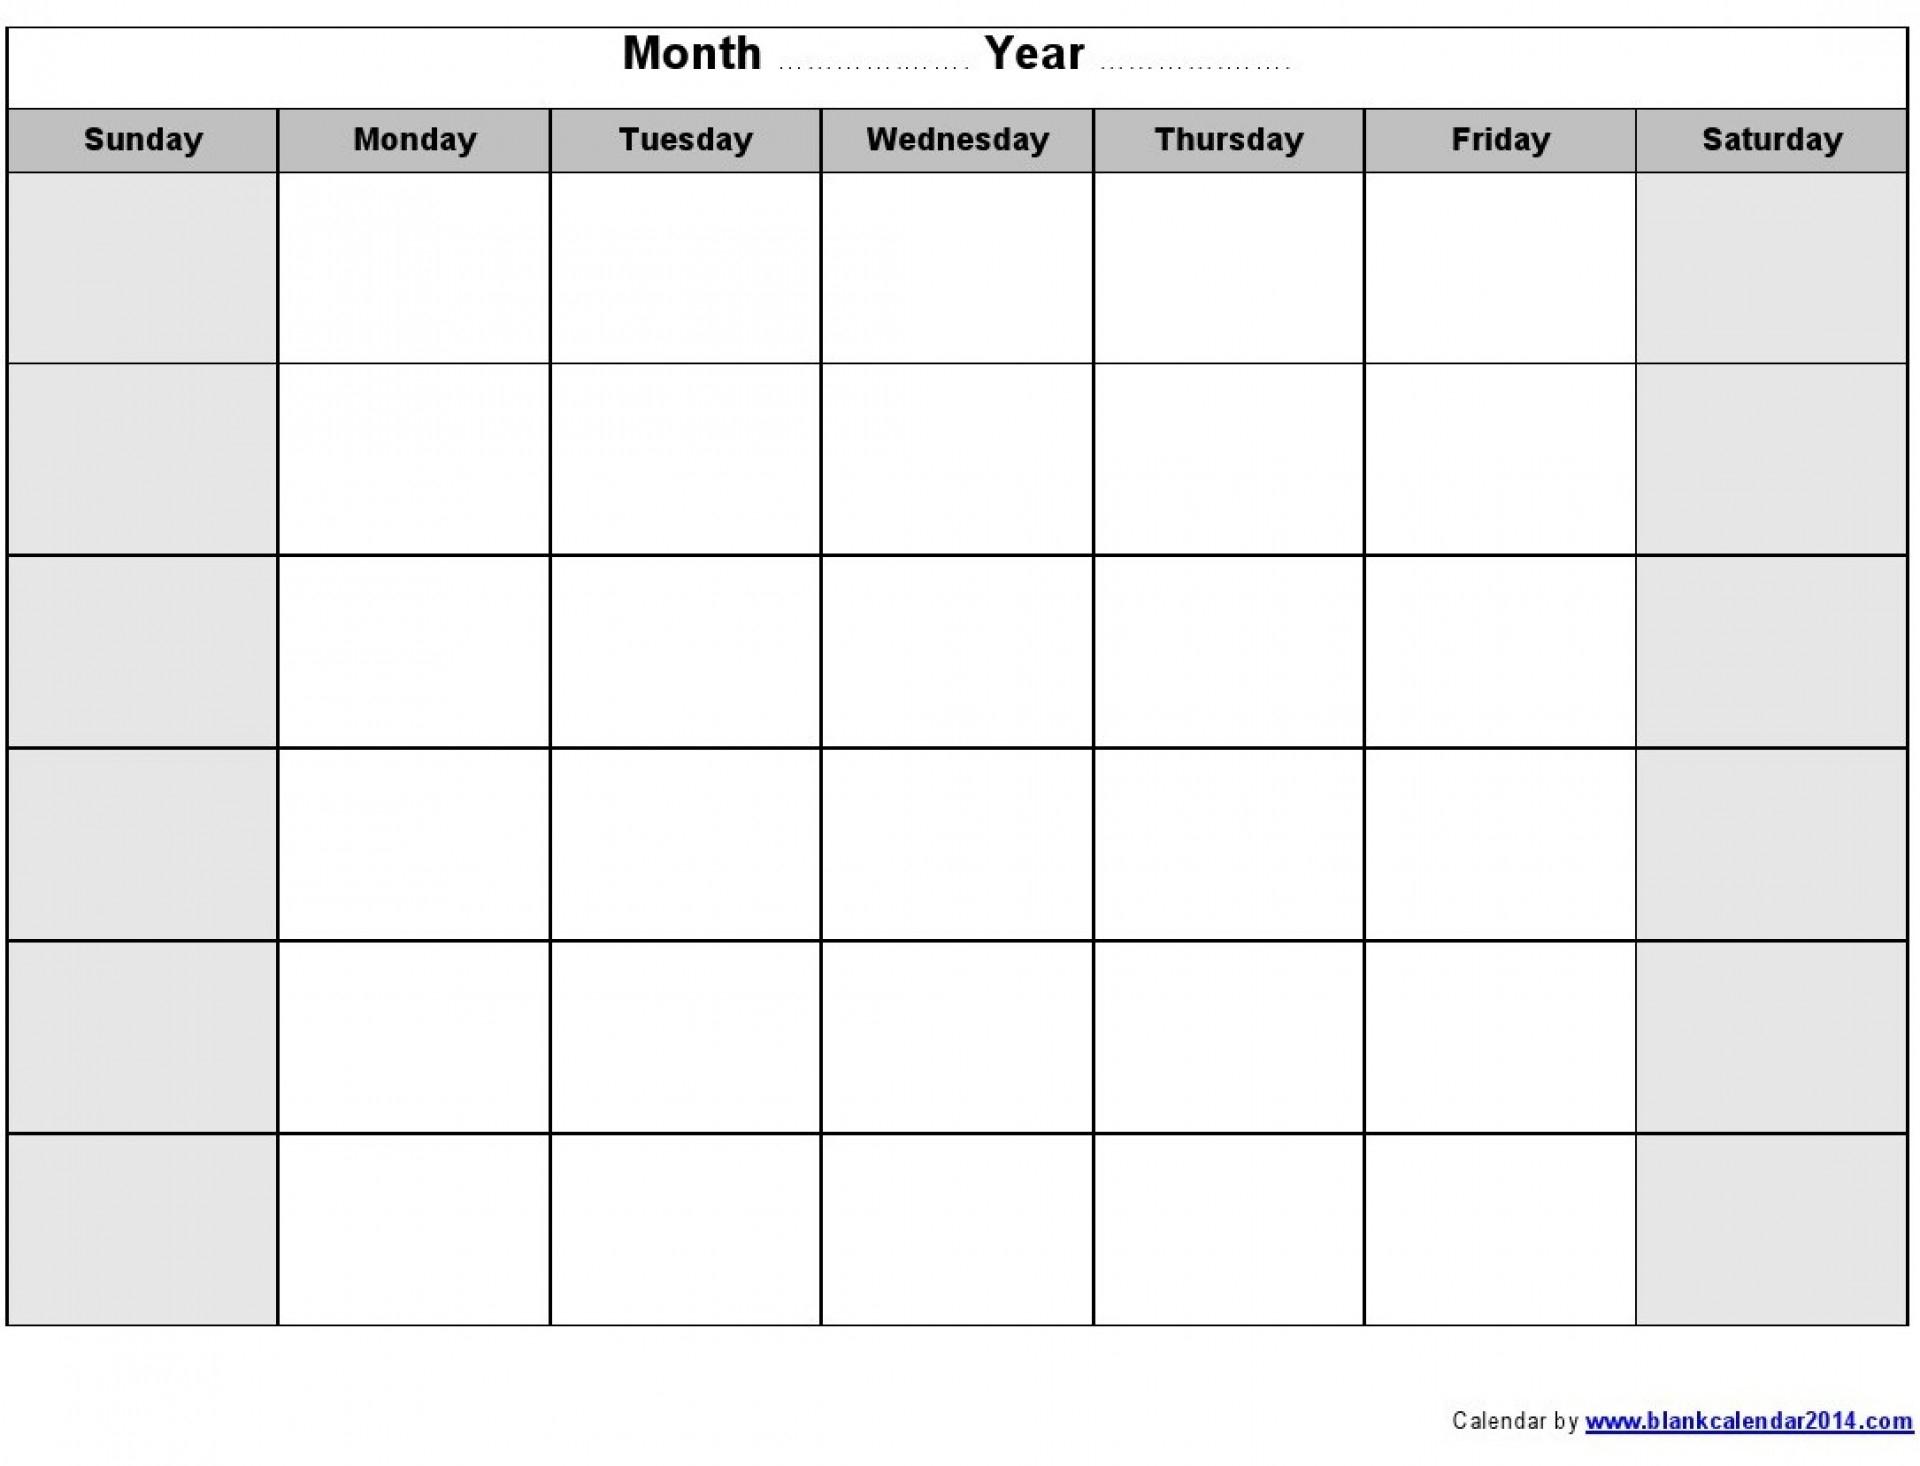 Blank Calendar Google